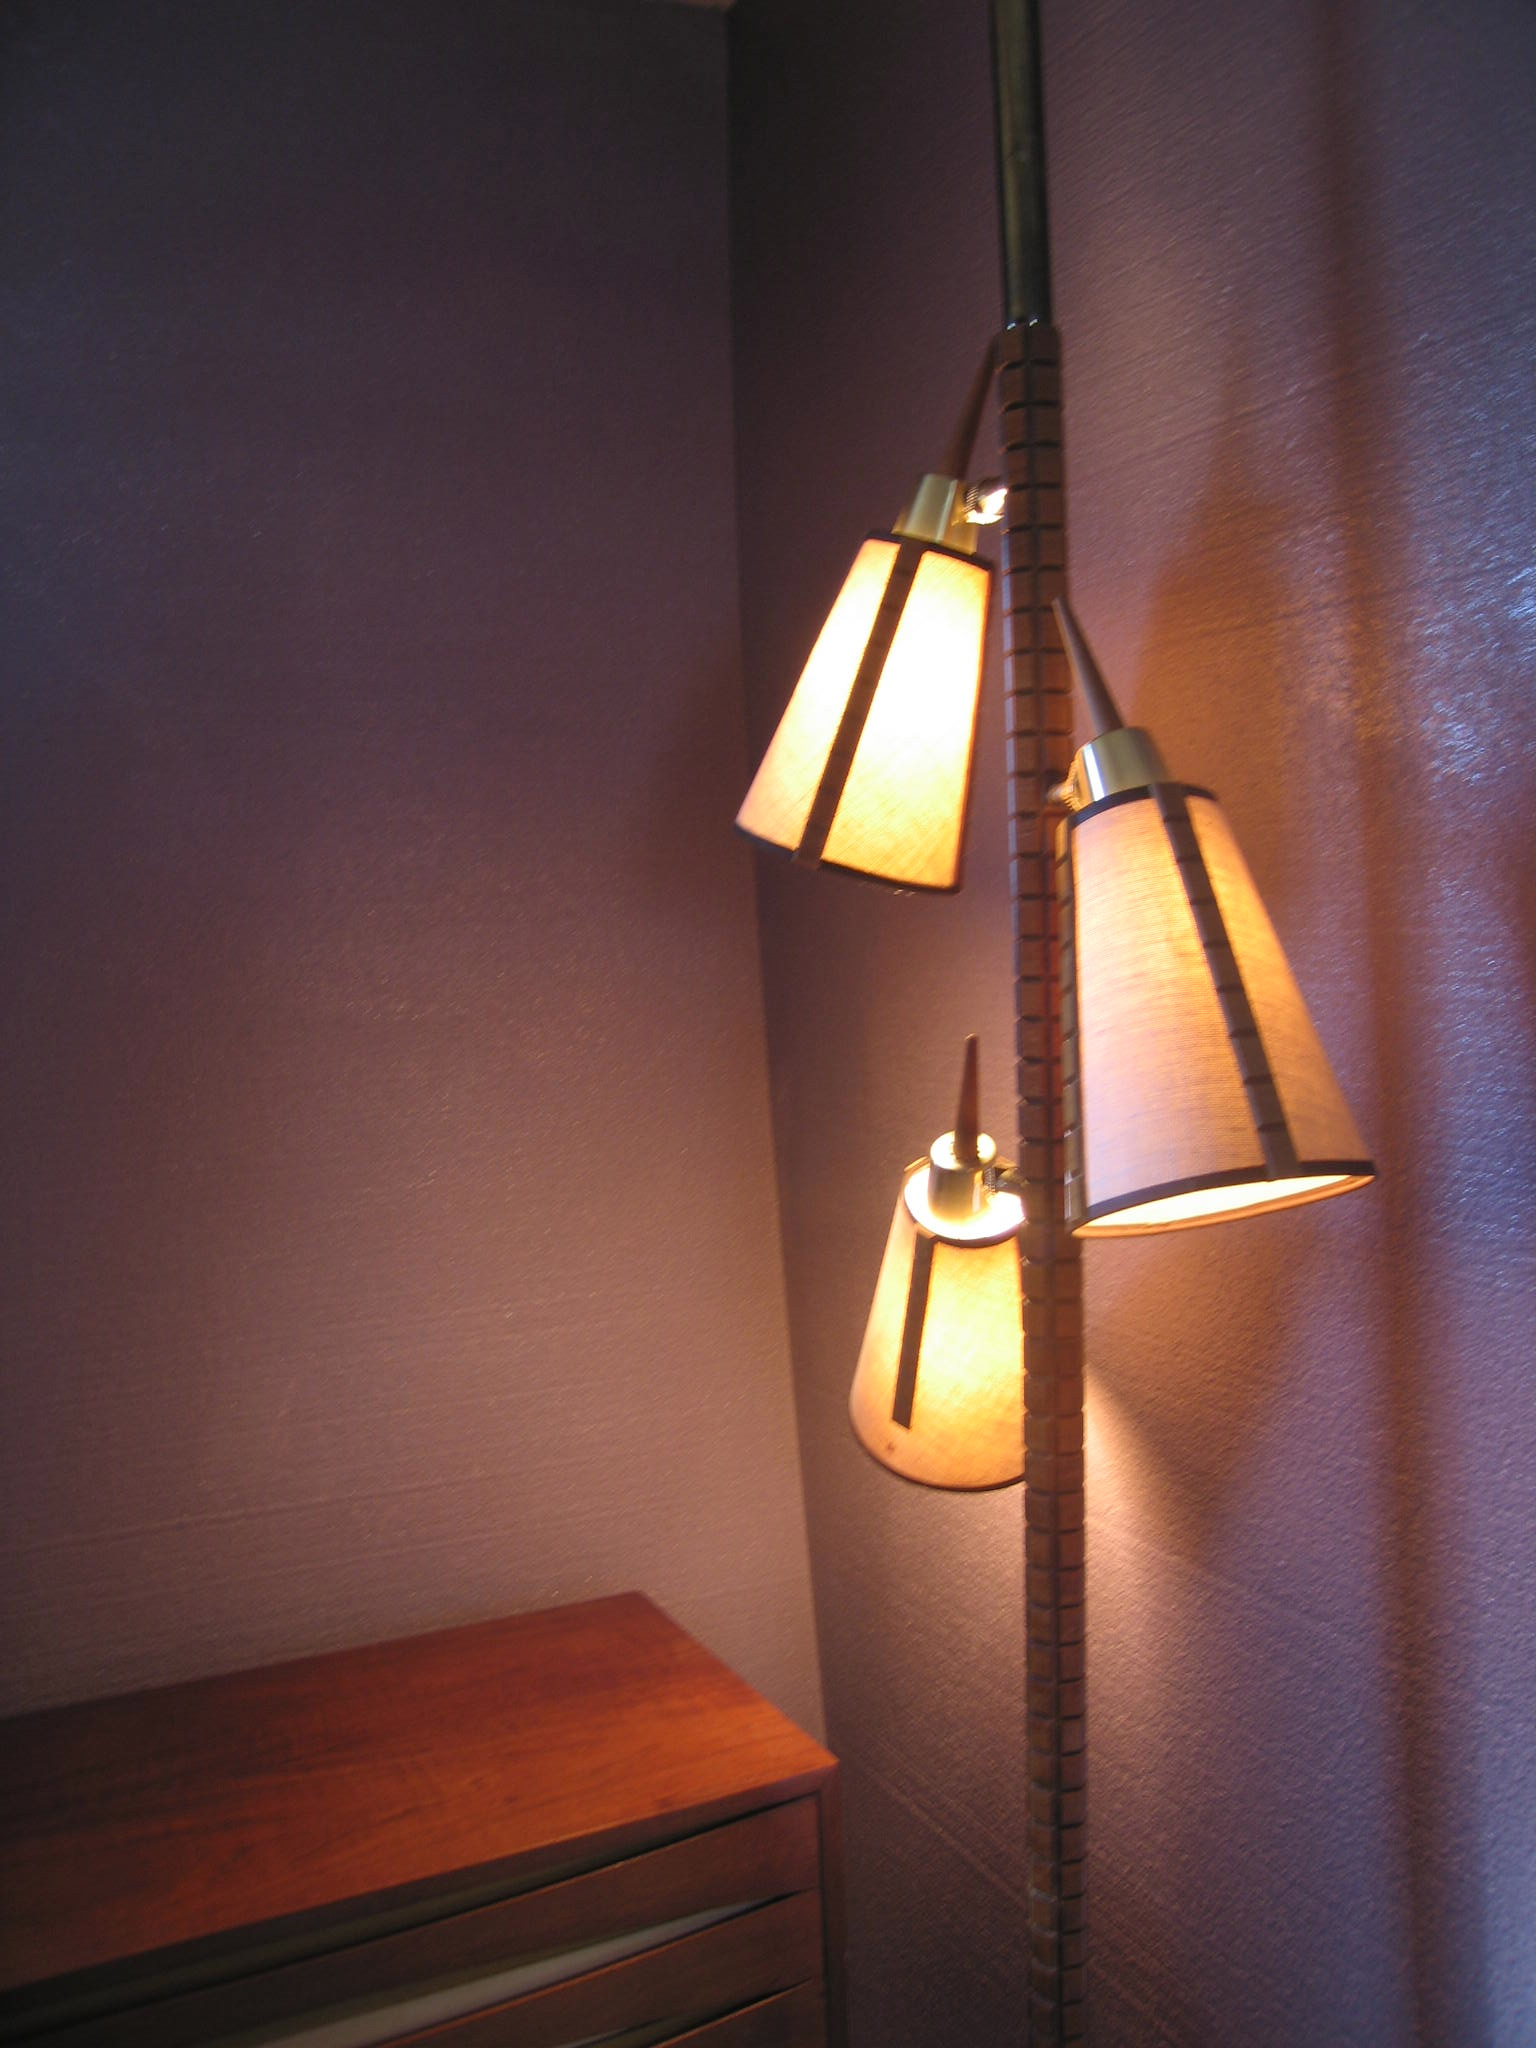 Vintage Tension Pole Lamp Photo 14